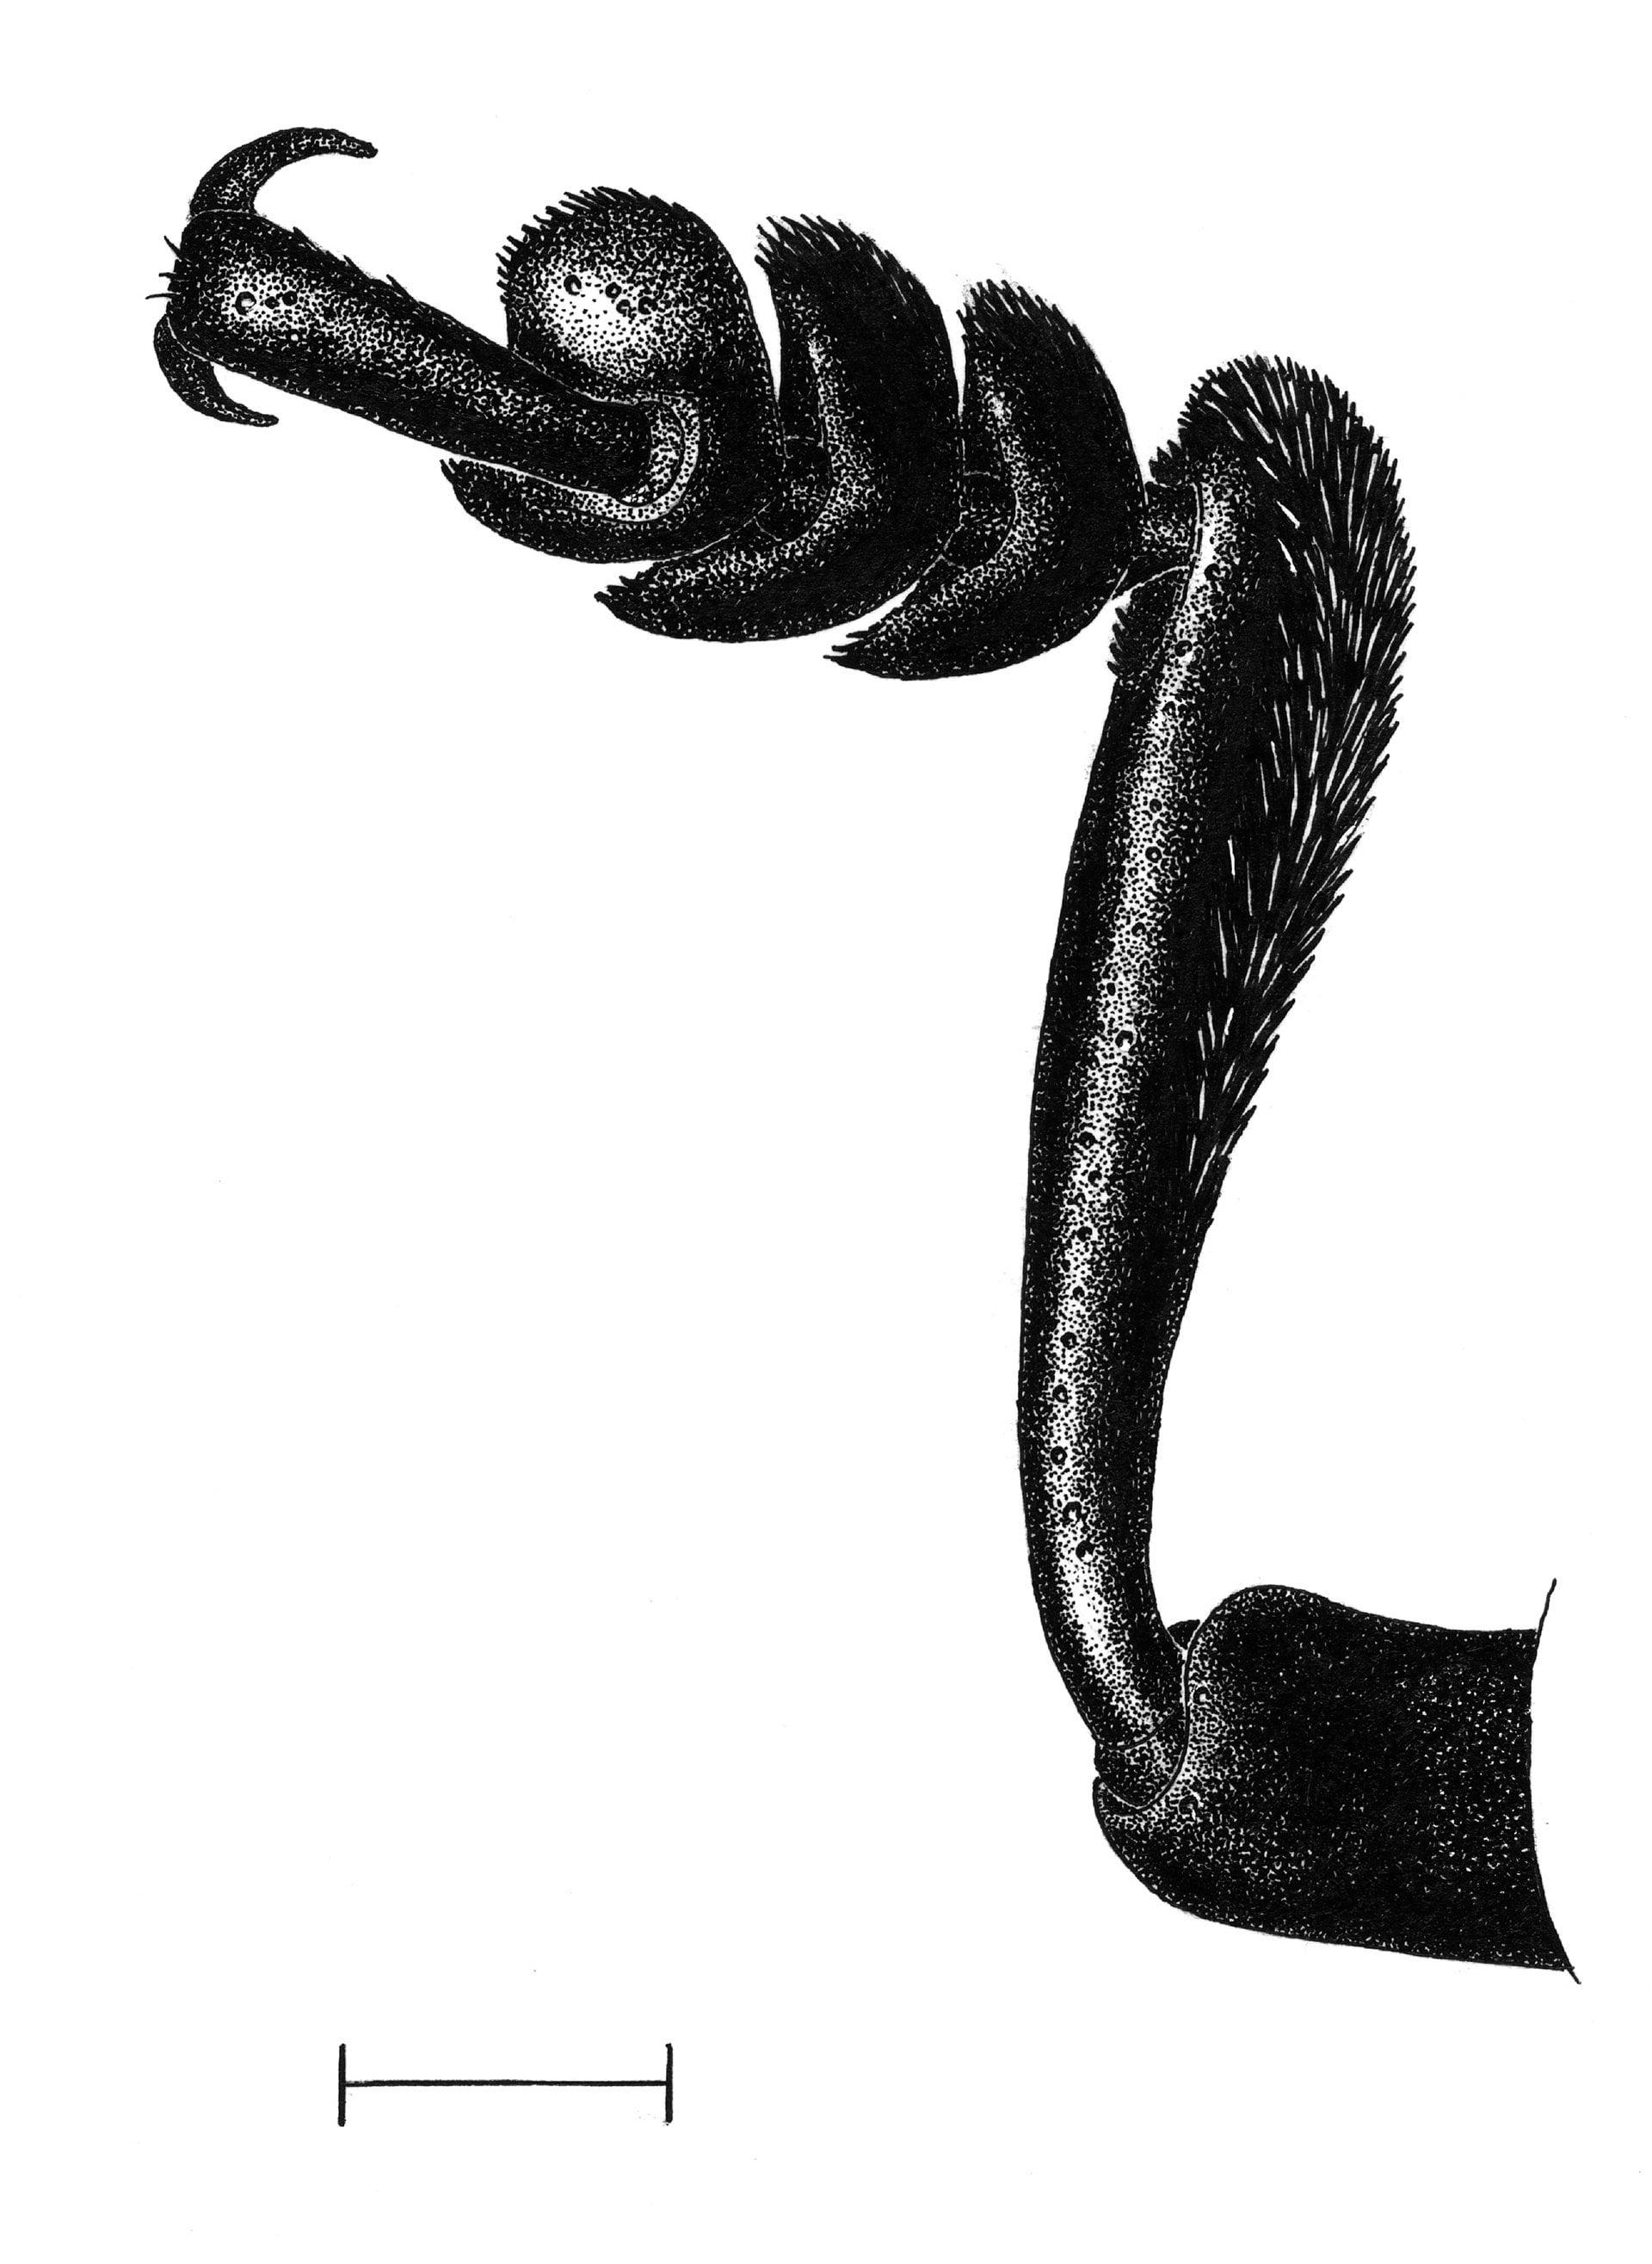 Tatzenblattkaefer Bein, Tierstudien, ikonaut